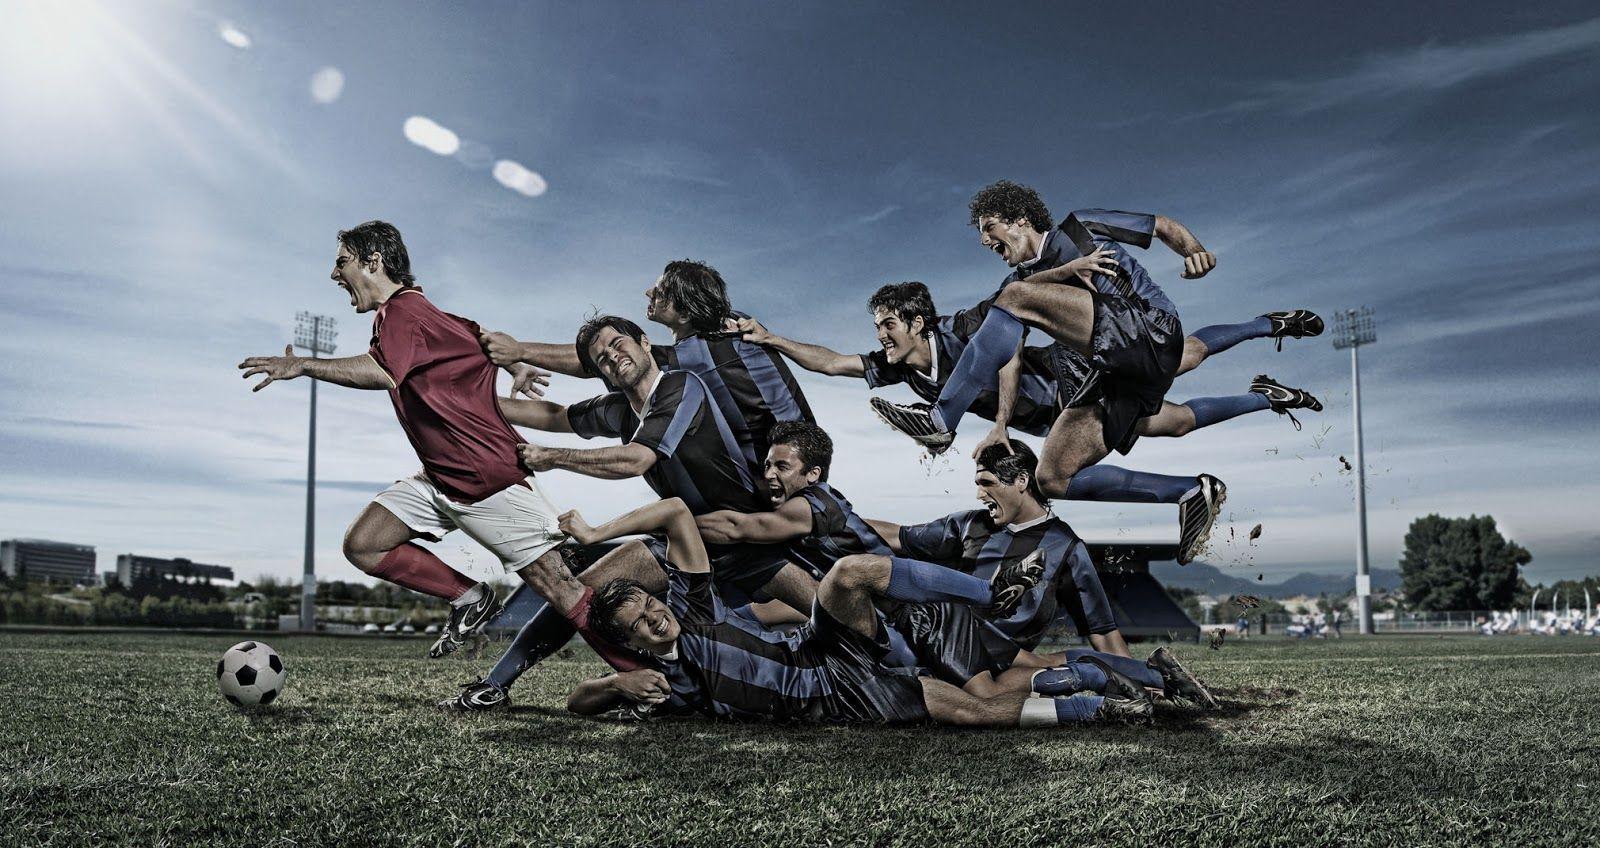 Sport Hd Wallpaper Sports Wallpapers